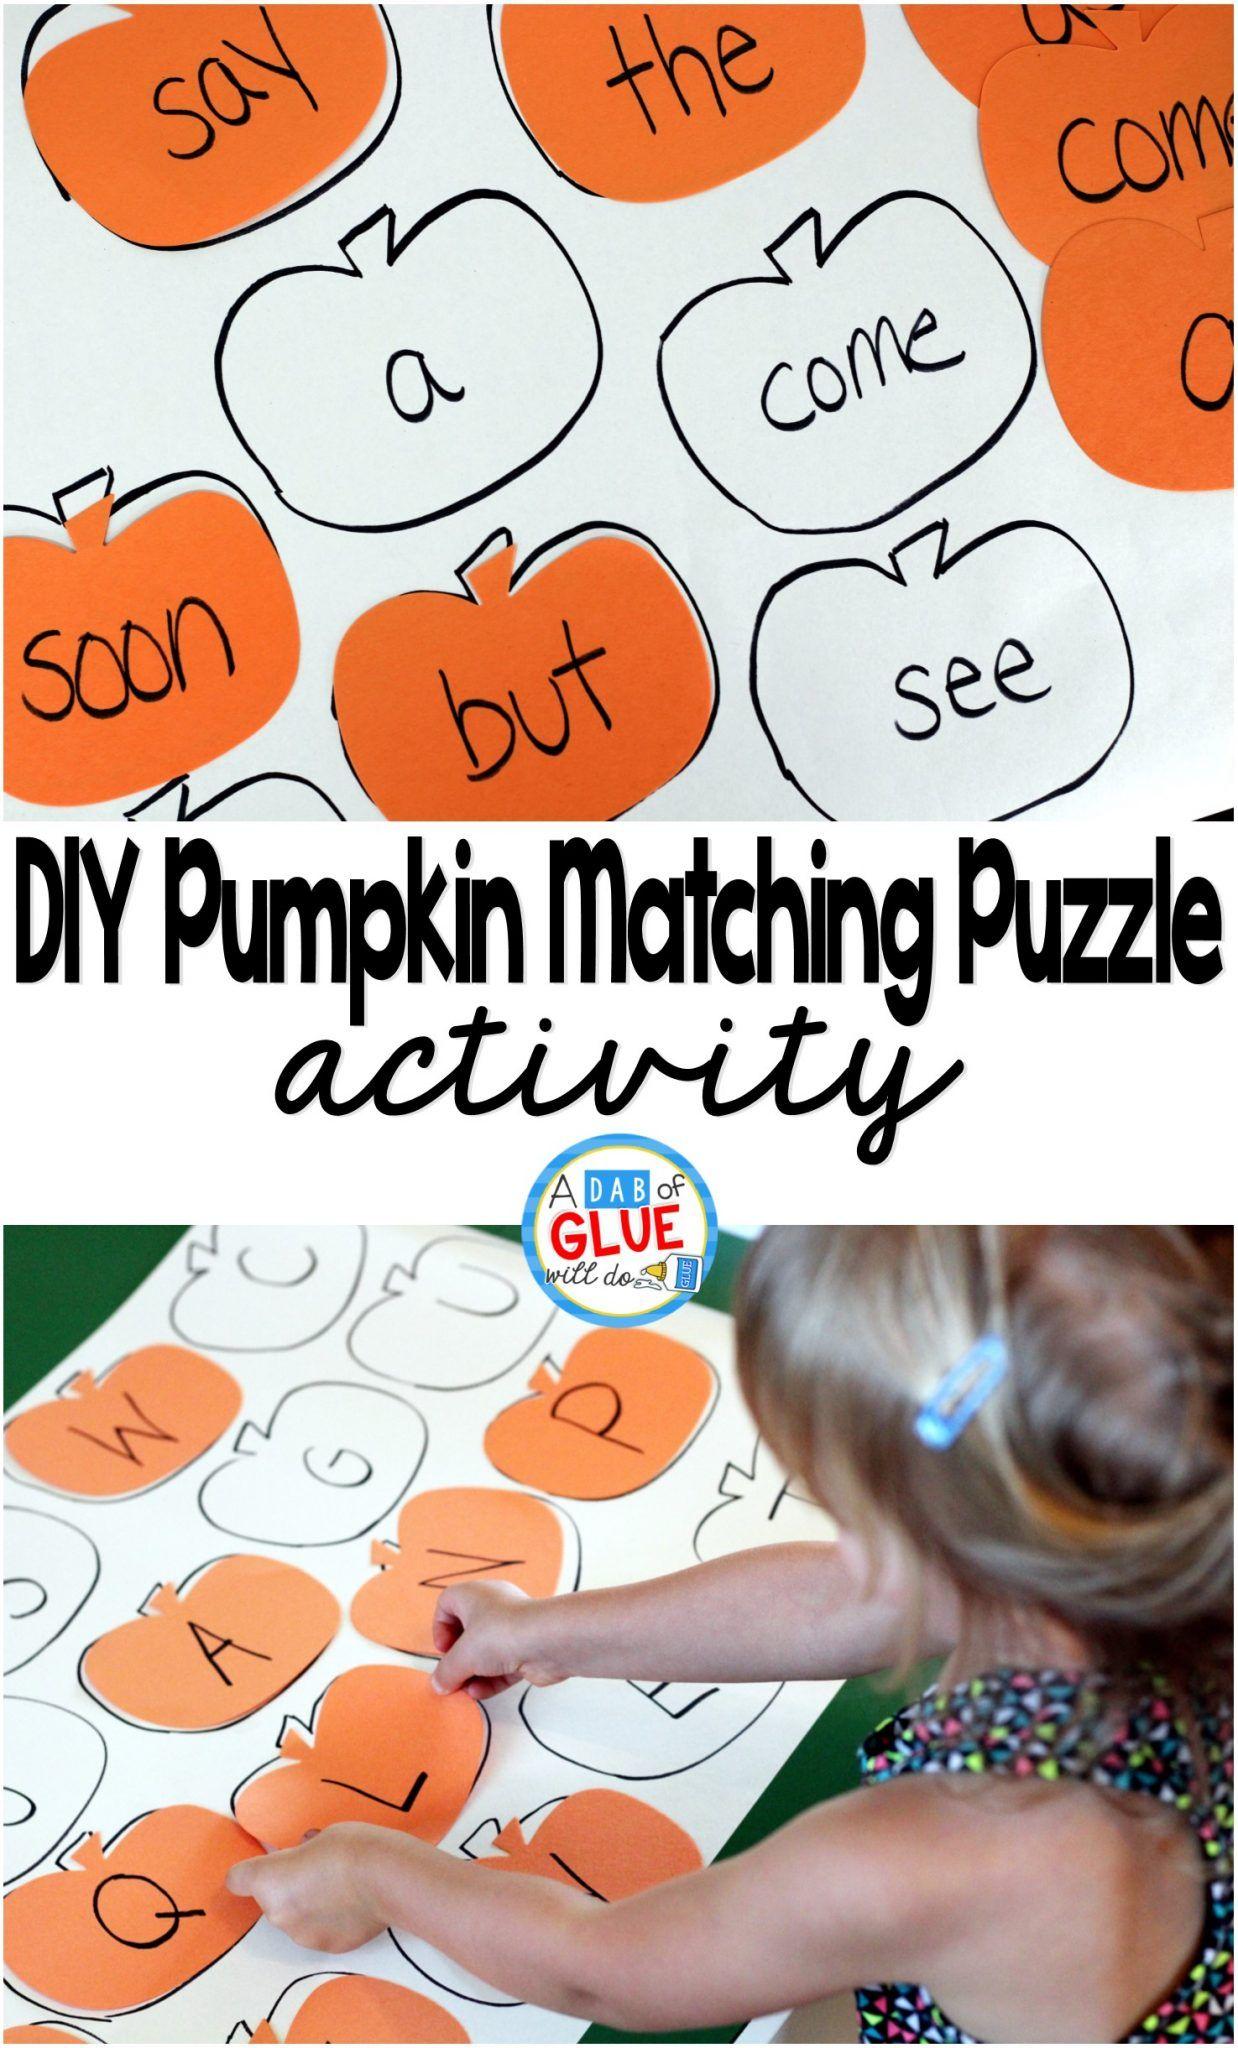 Diy Pumpkin Matching Puzzle